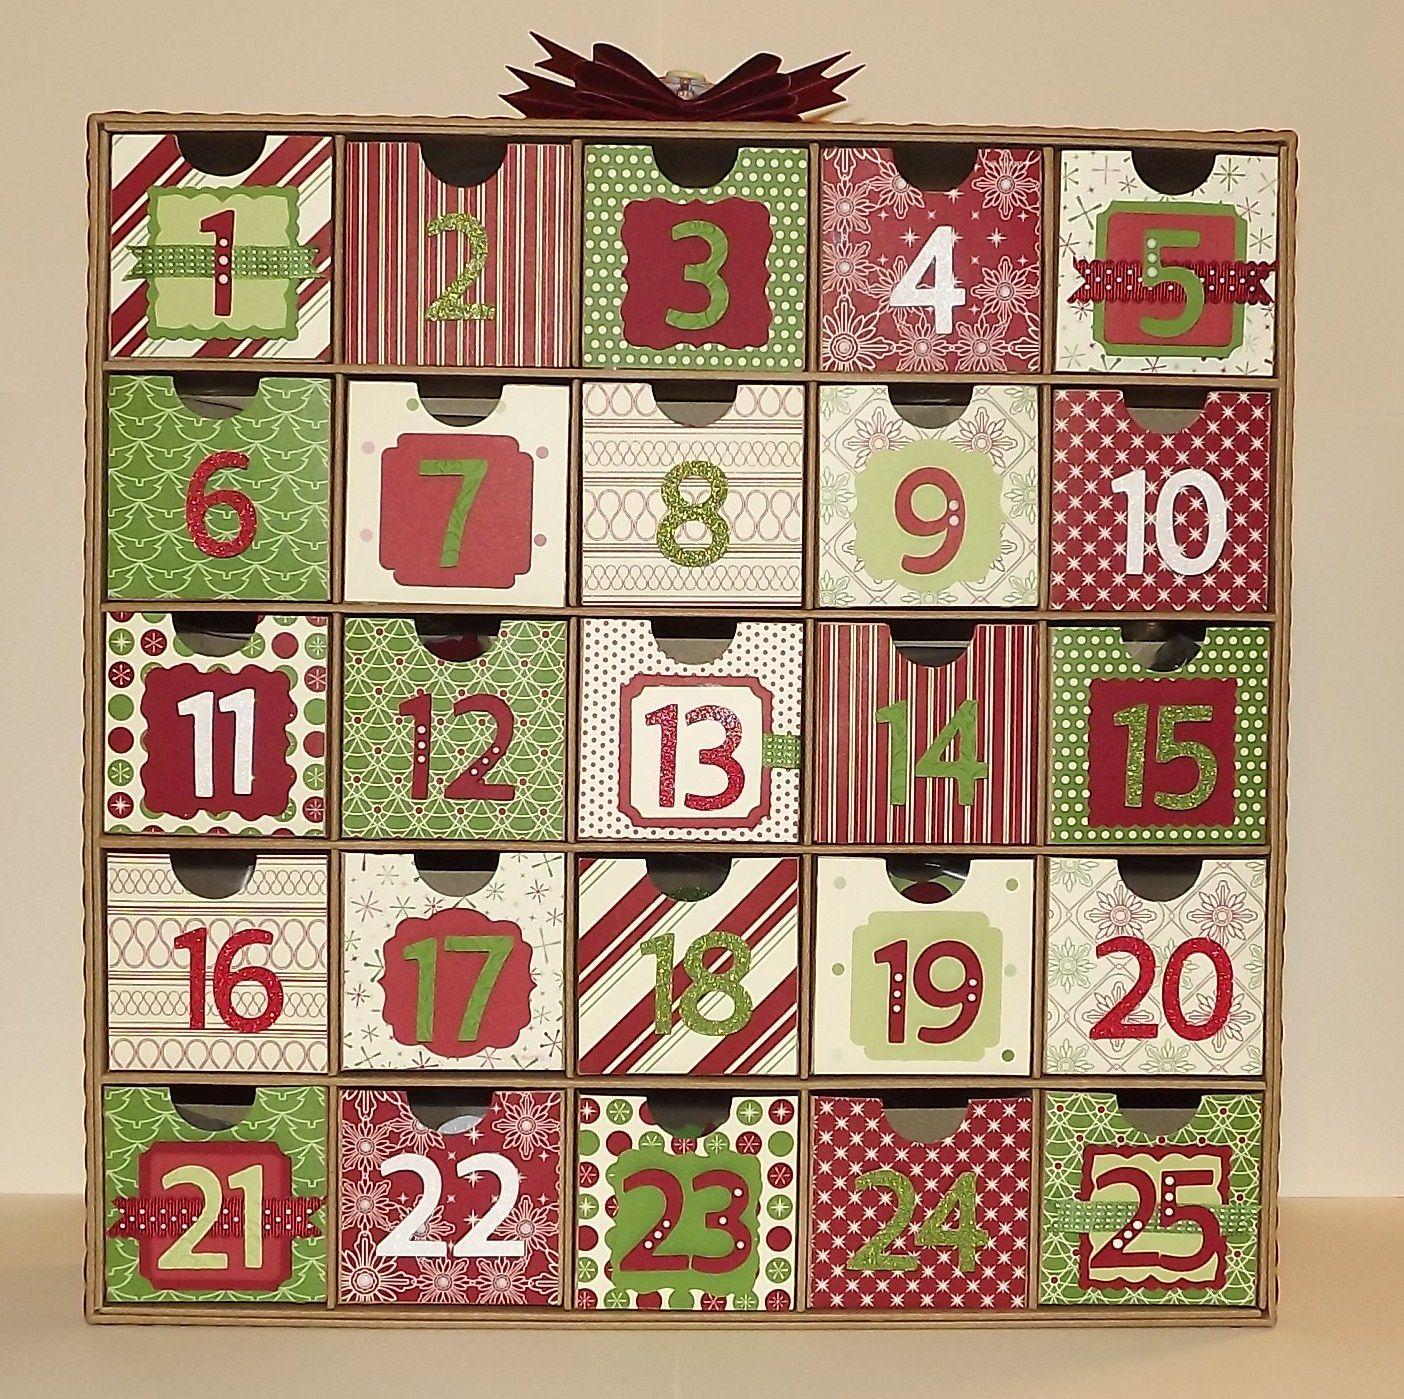 Tamra's Crafty Paper Creations: Christmas Advent Calendar ...